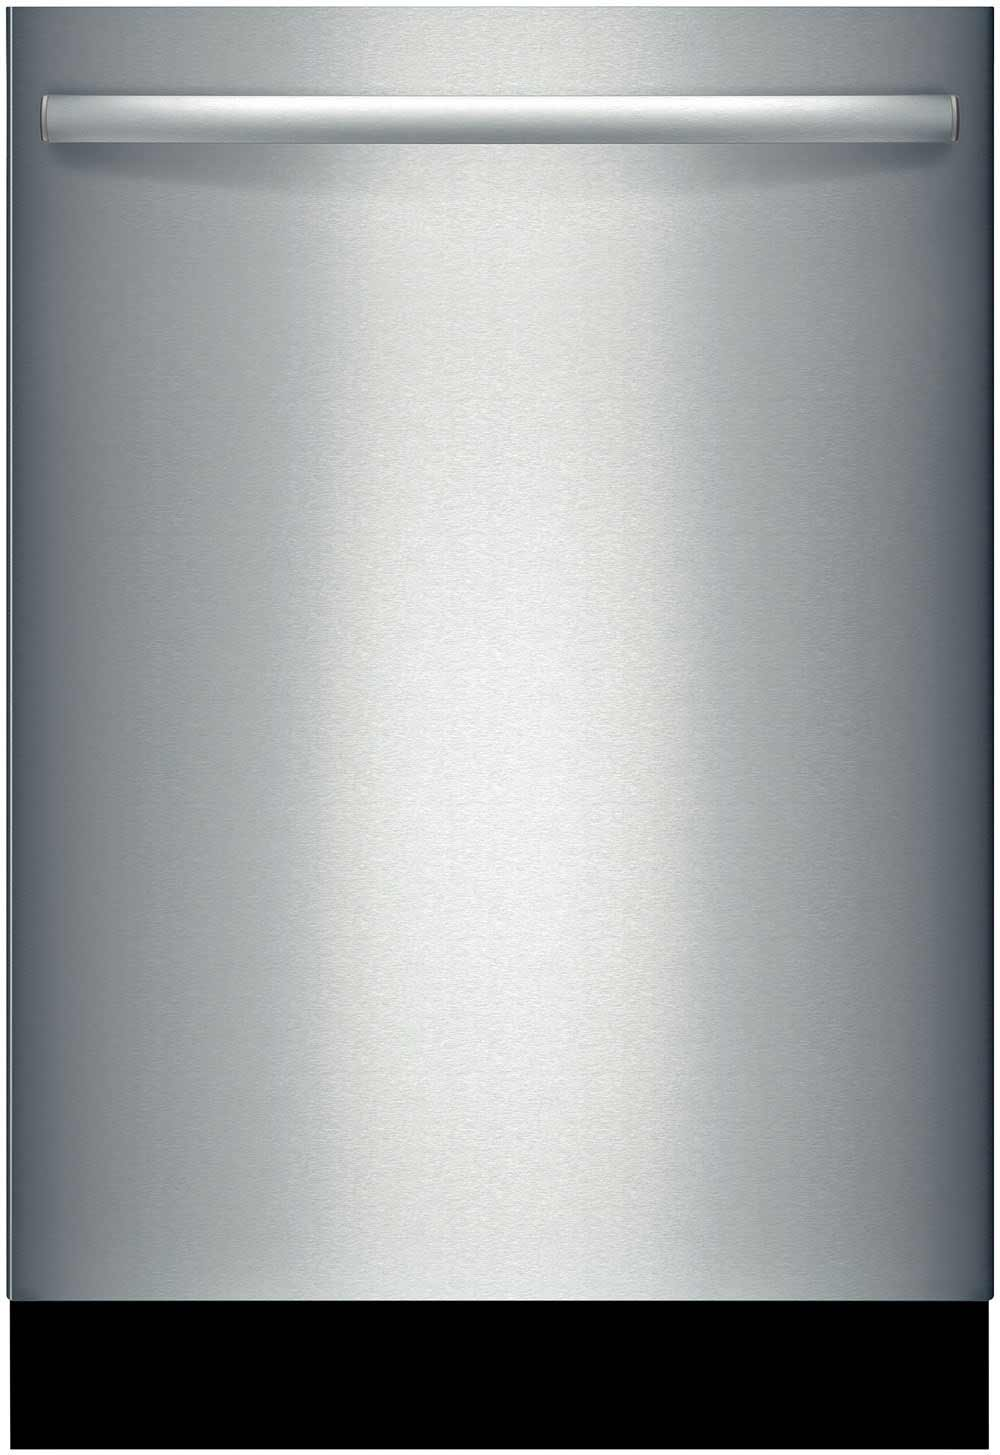 Bosch Semi Integrated Best Value Dishwasher